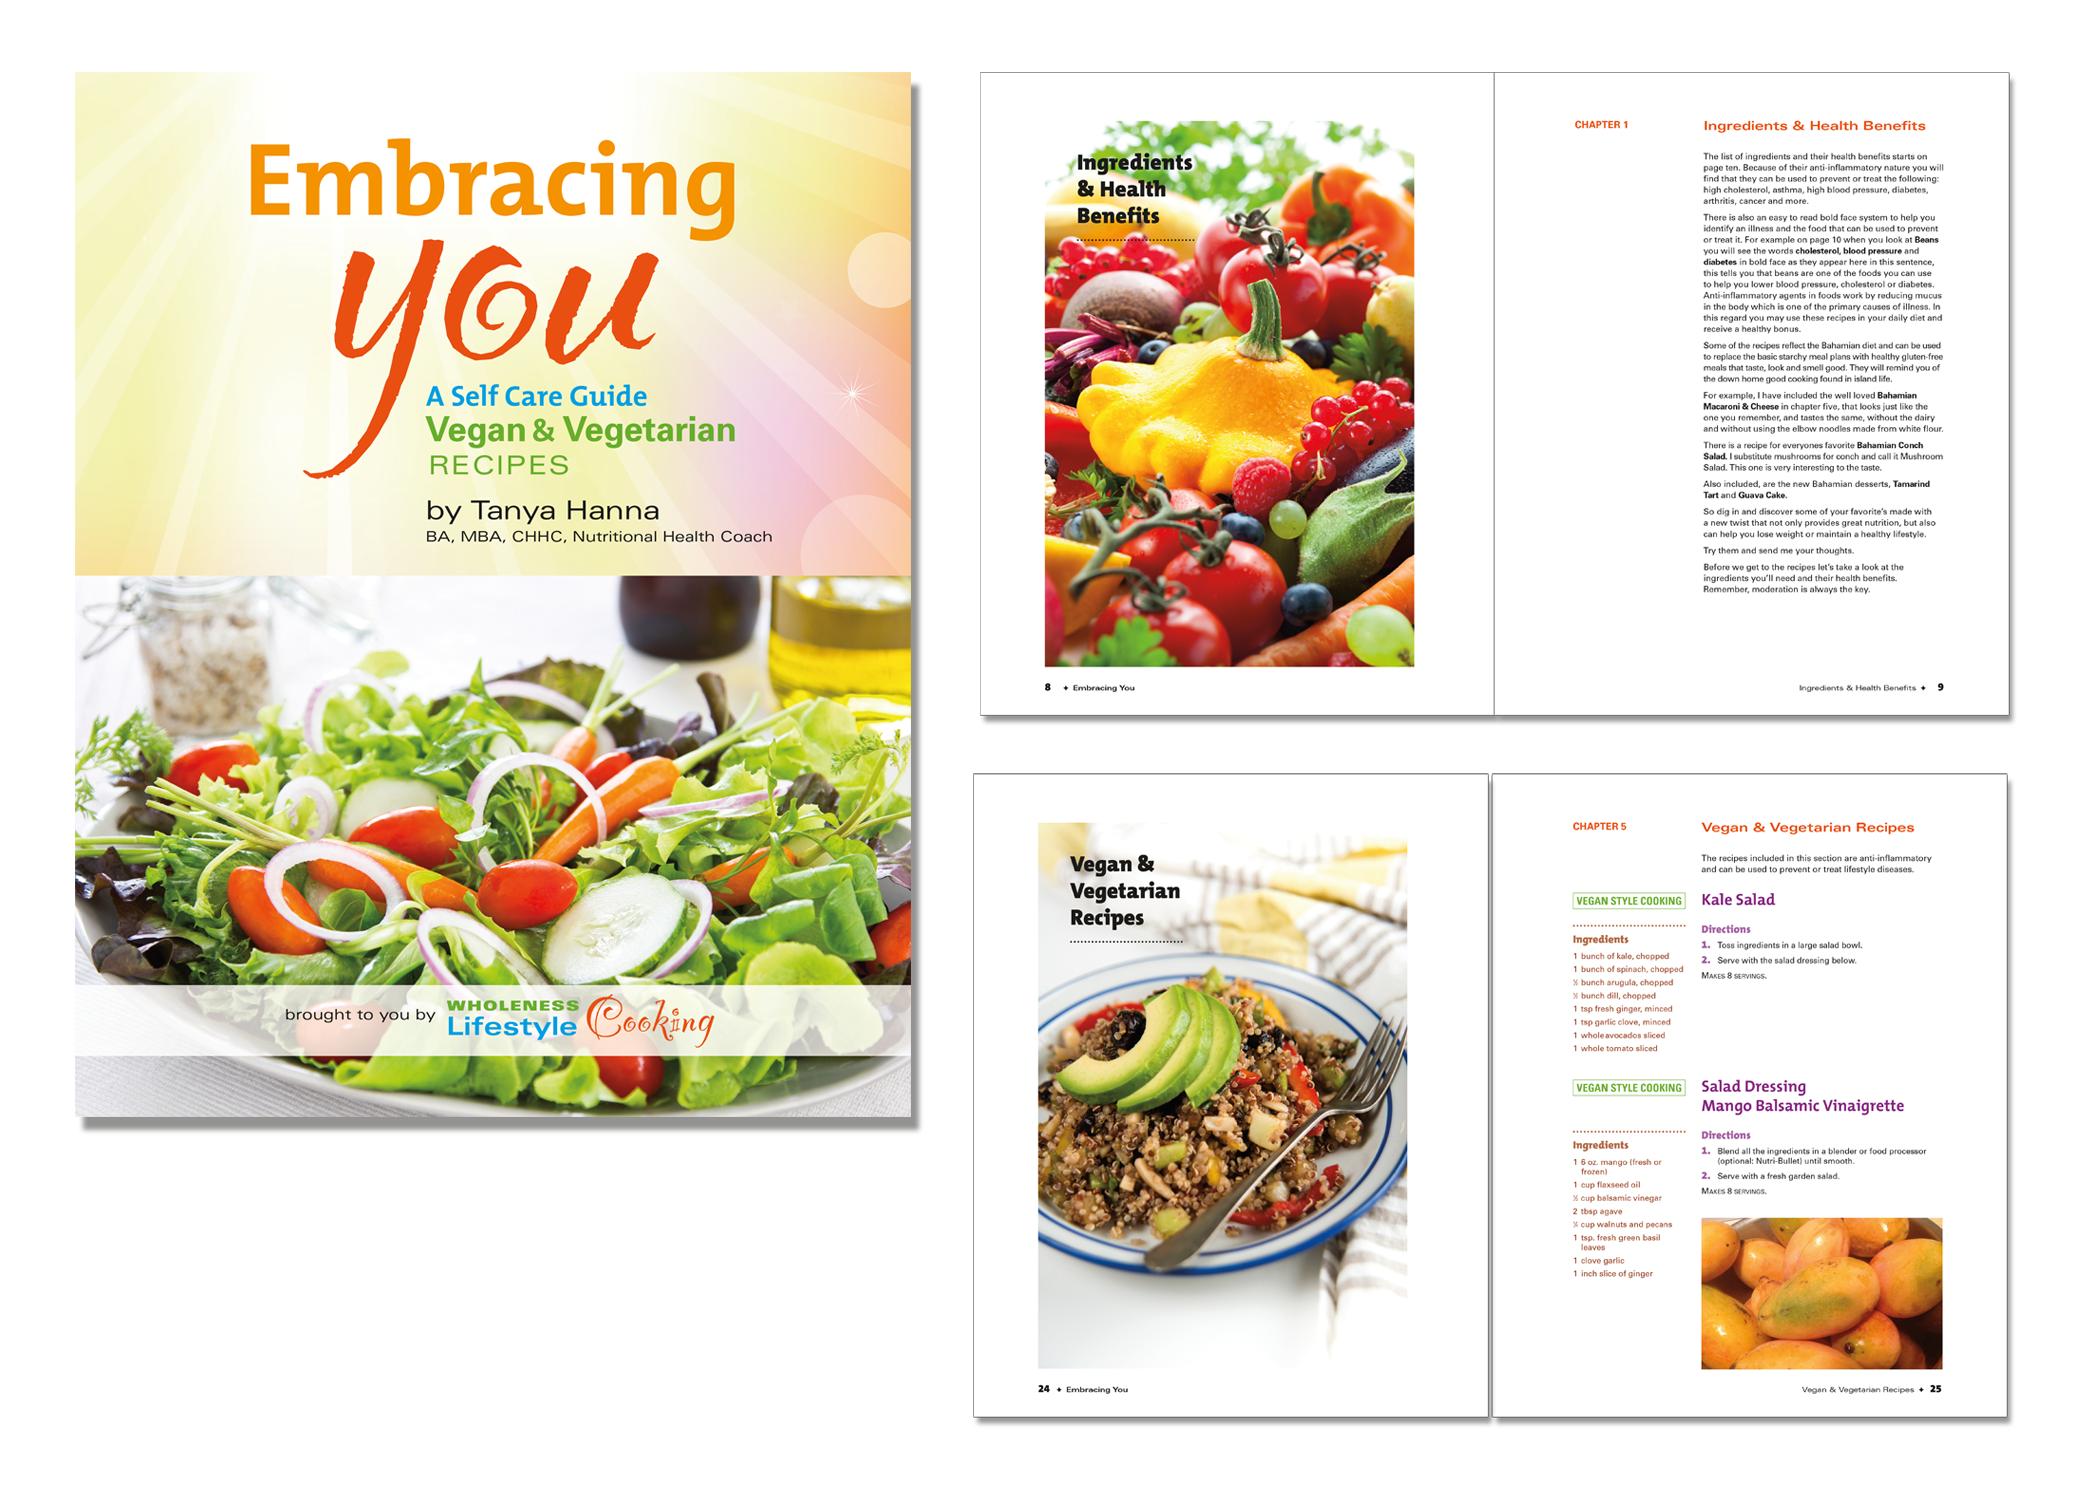 Embracing You cookbook